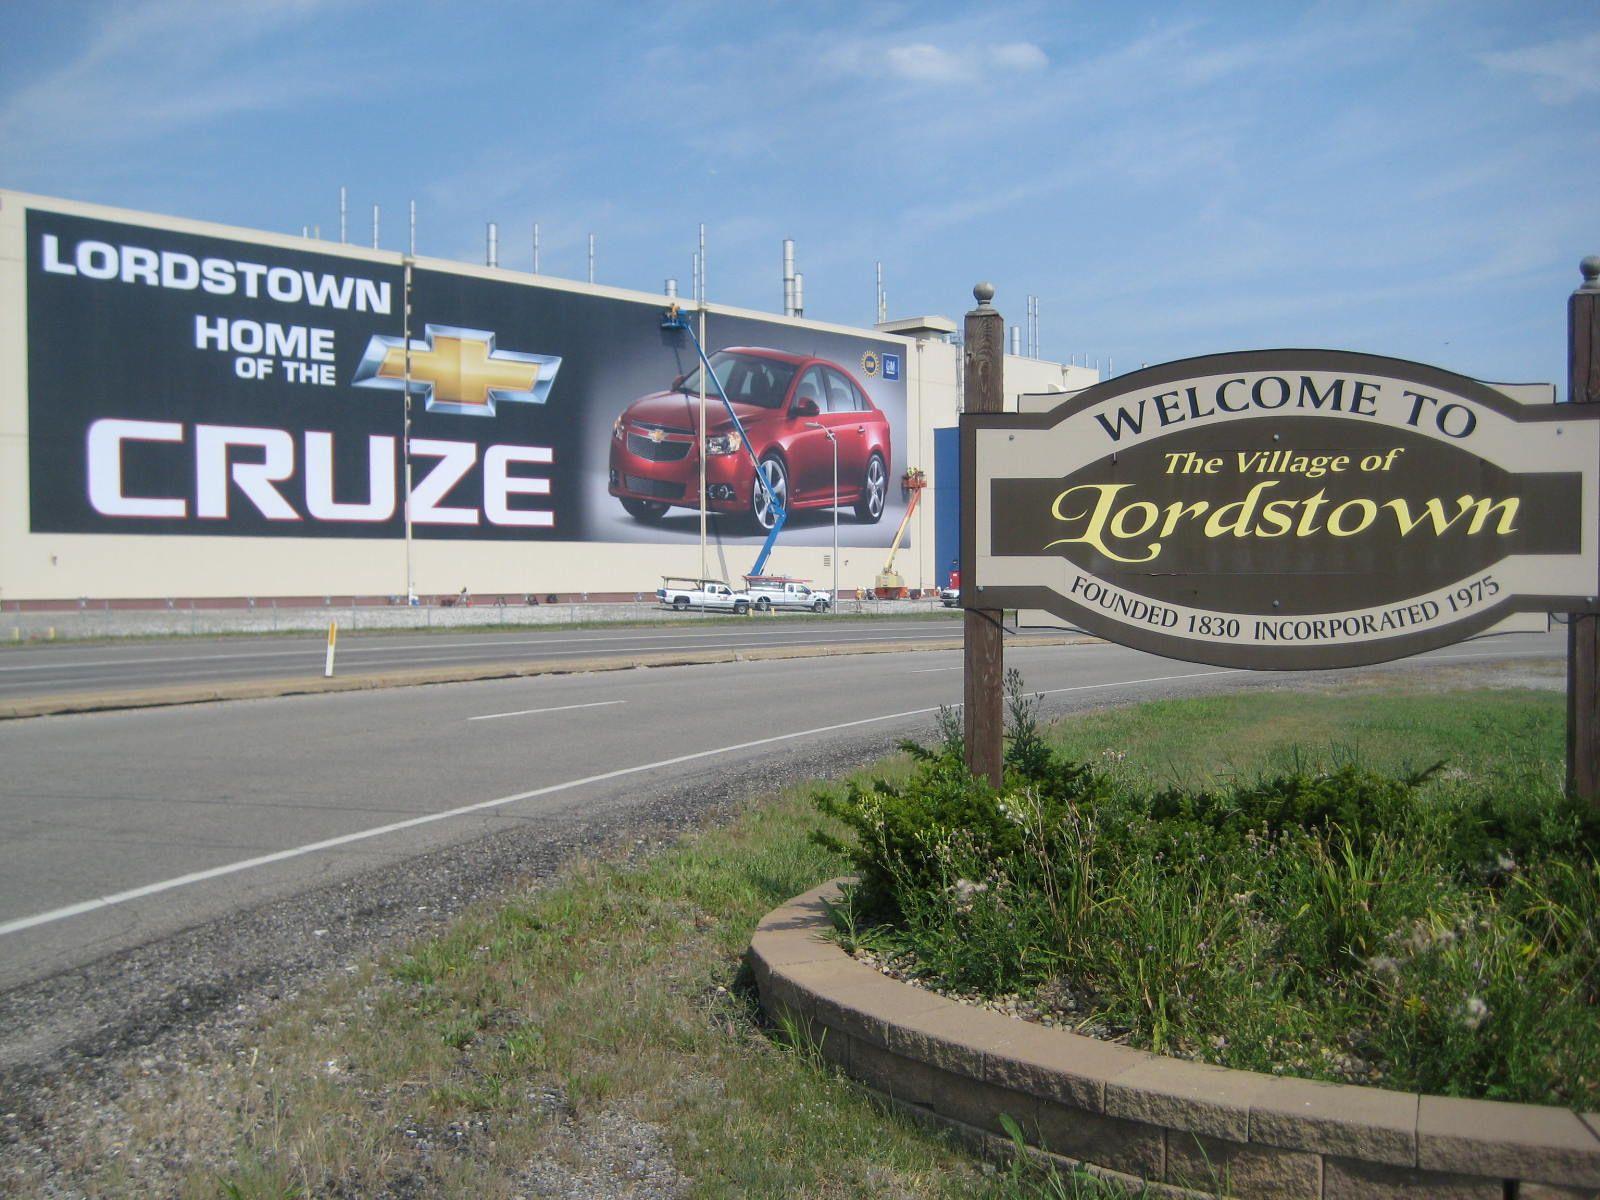 GM to Build Next-Generation Chevrolet Cruze in Ohio